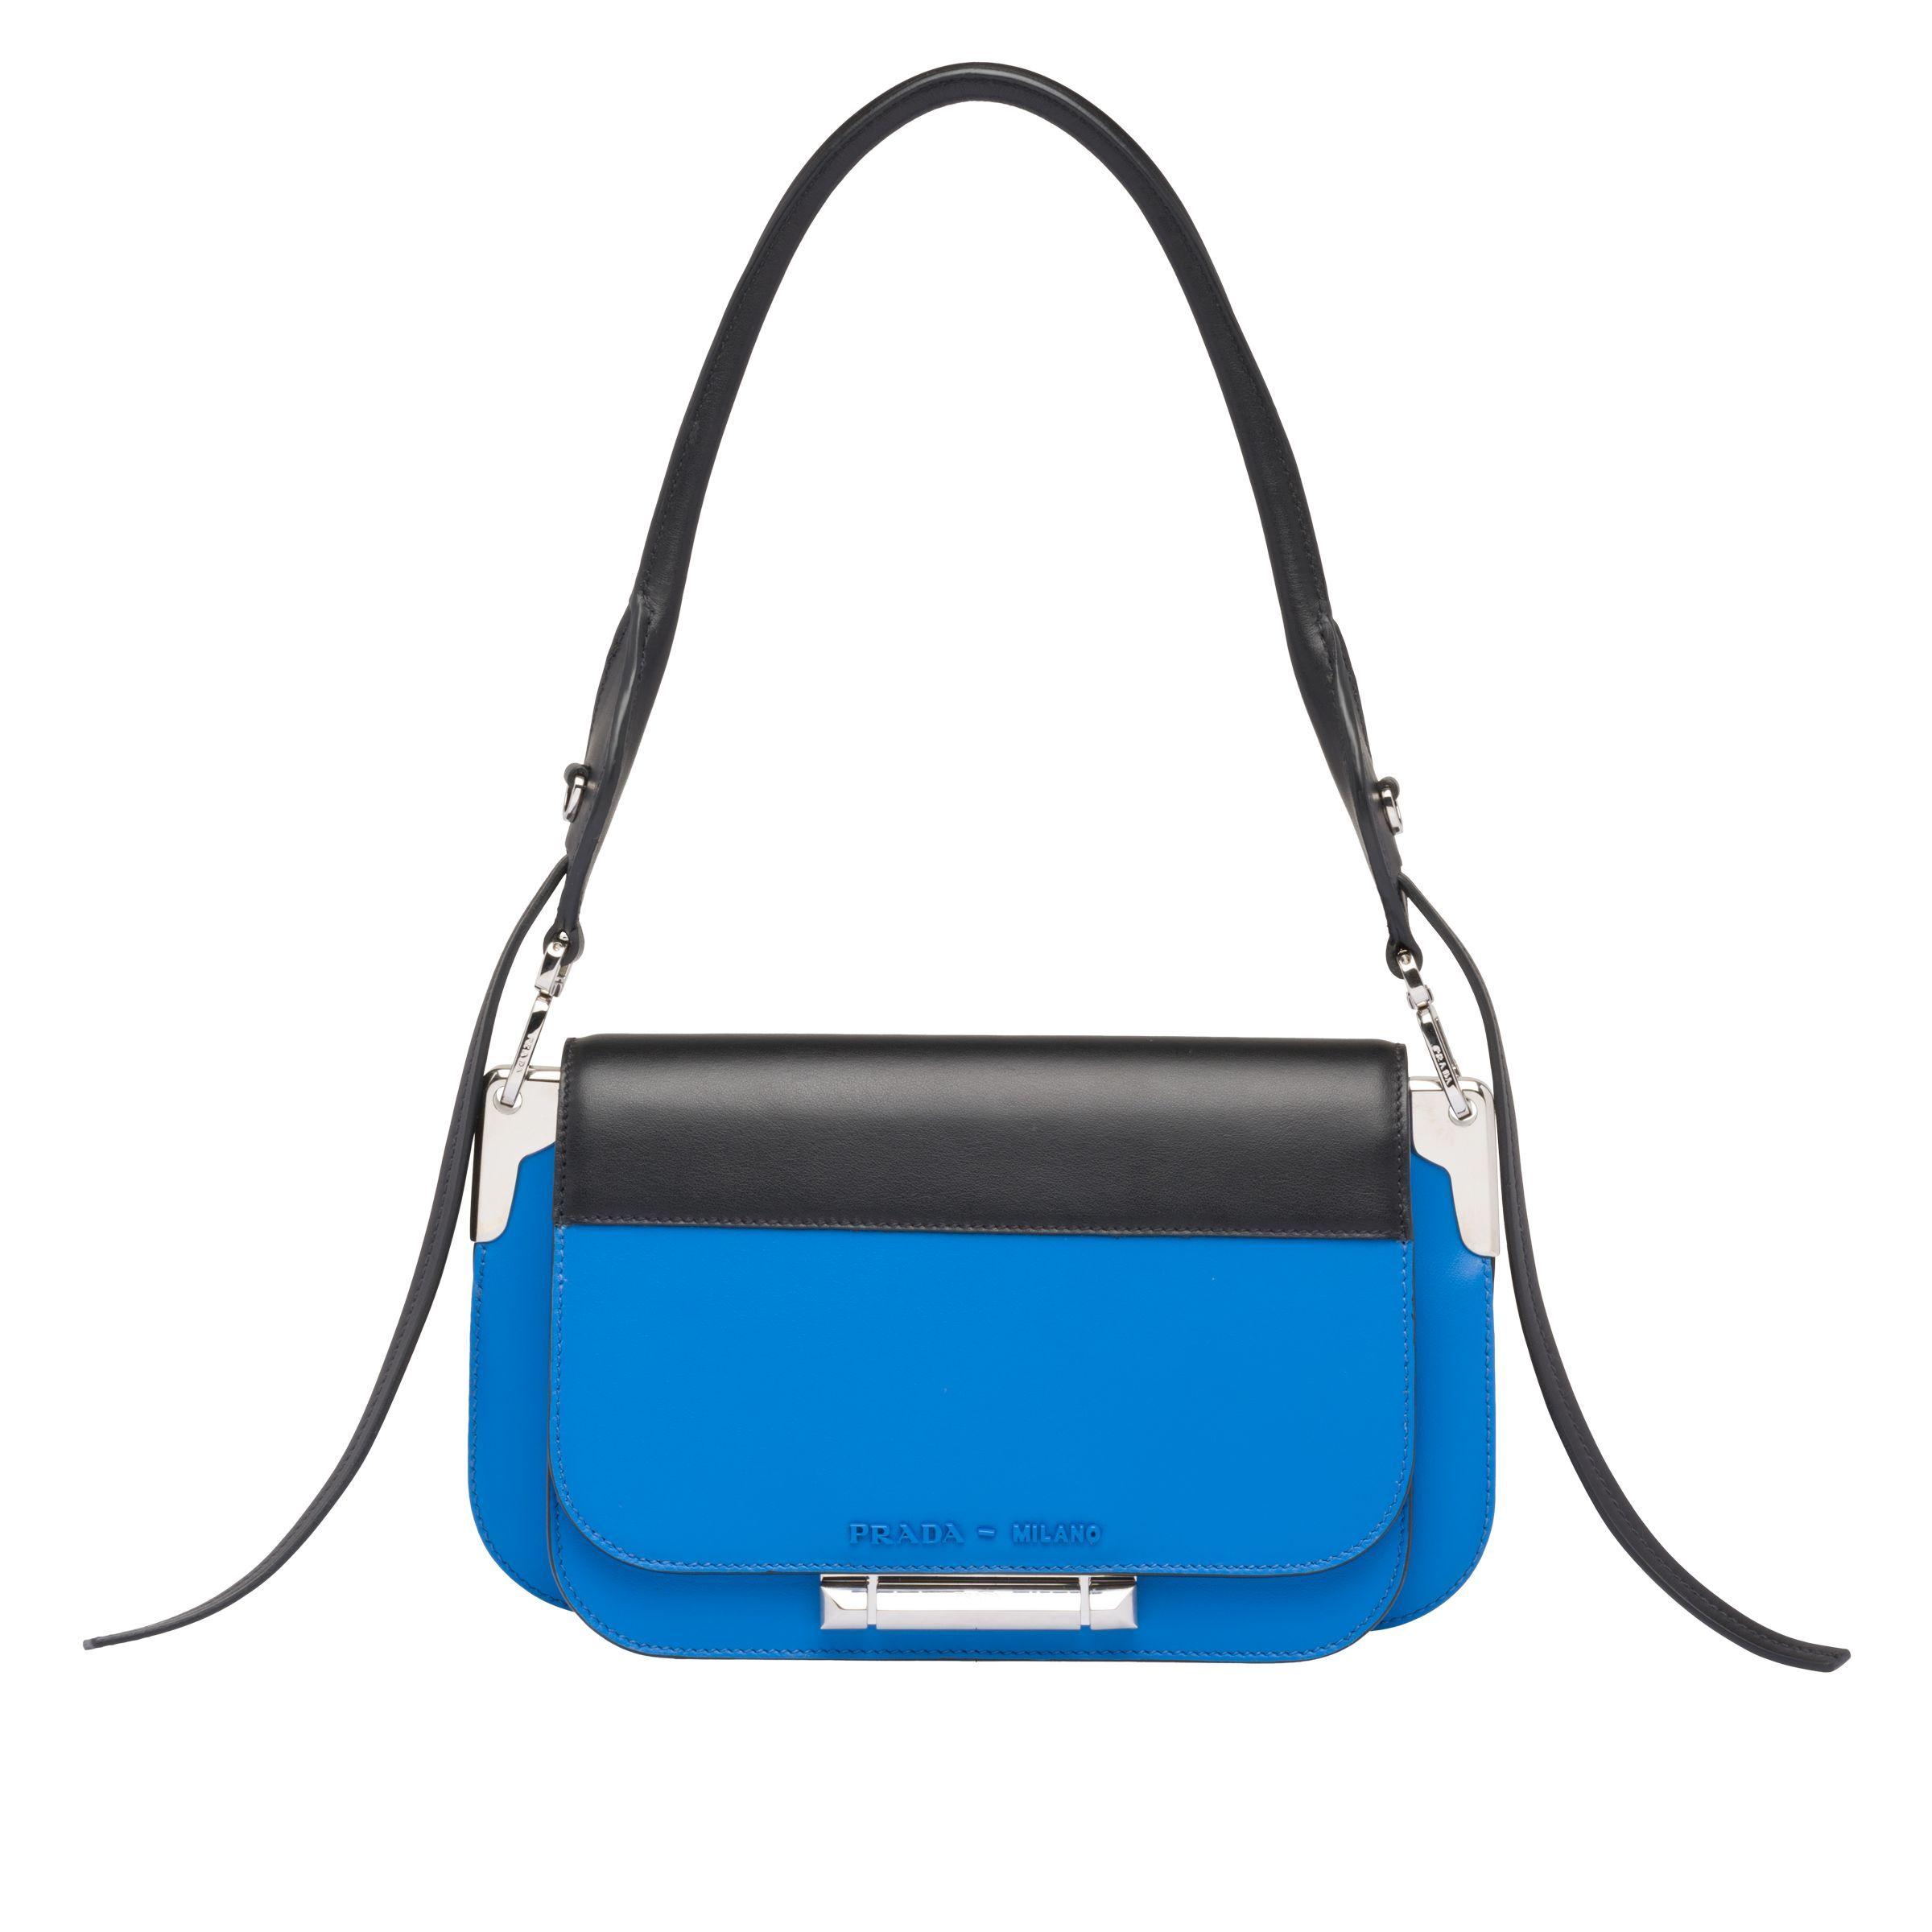 16a49a0d12 Sybille leather shoulder bag in 2019 | SHOPPING | Bags, Prada, Prada bag